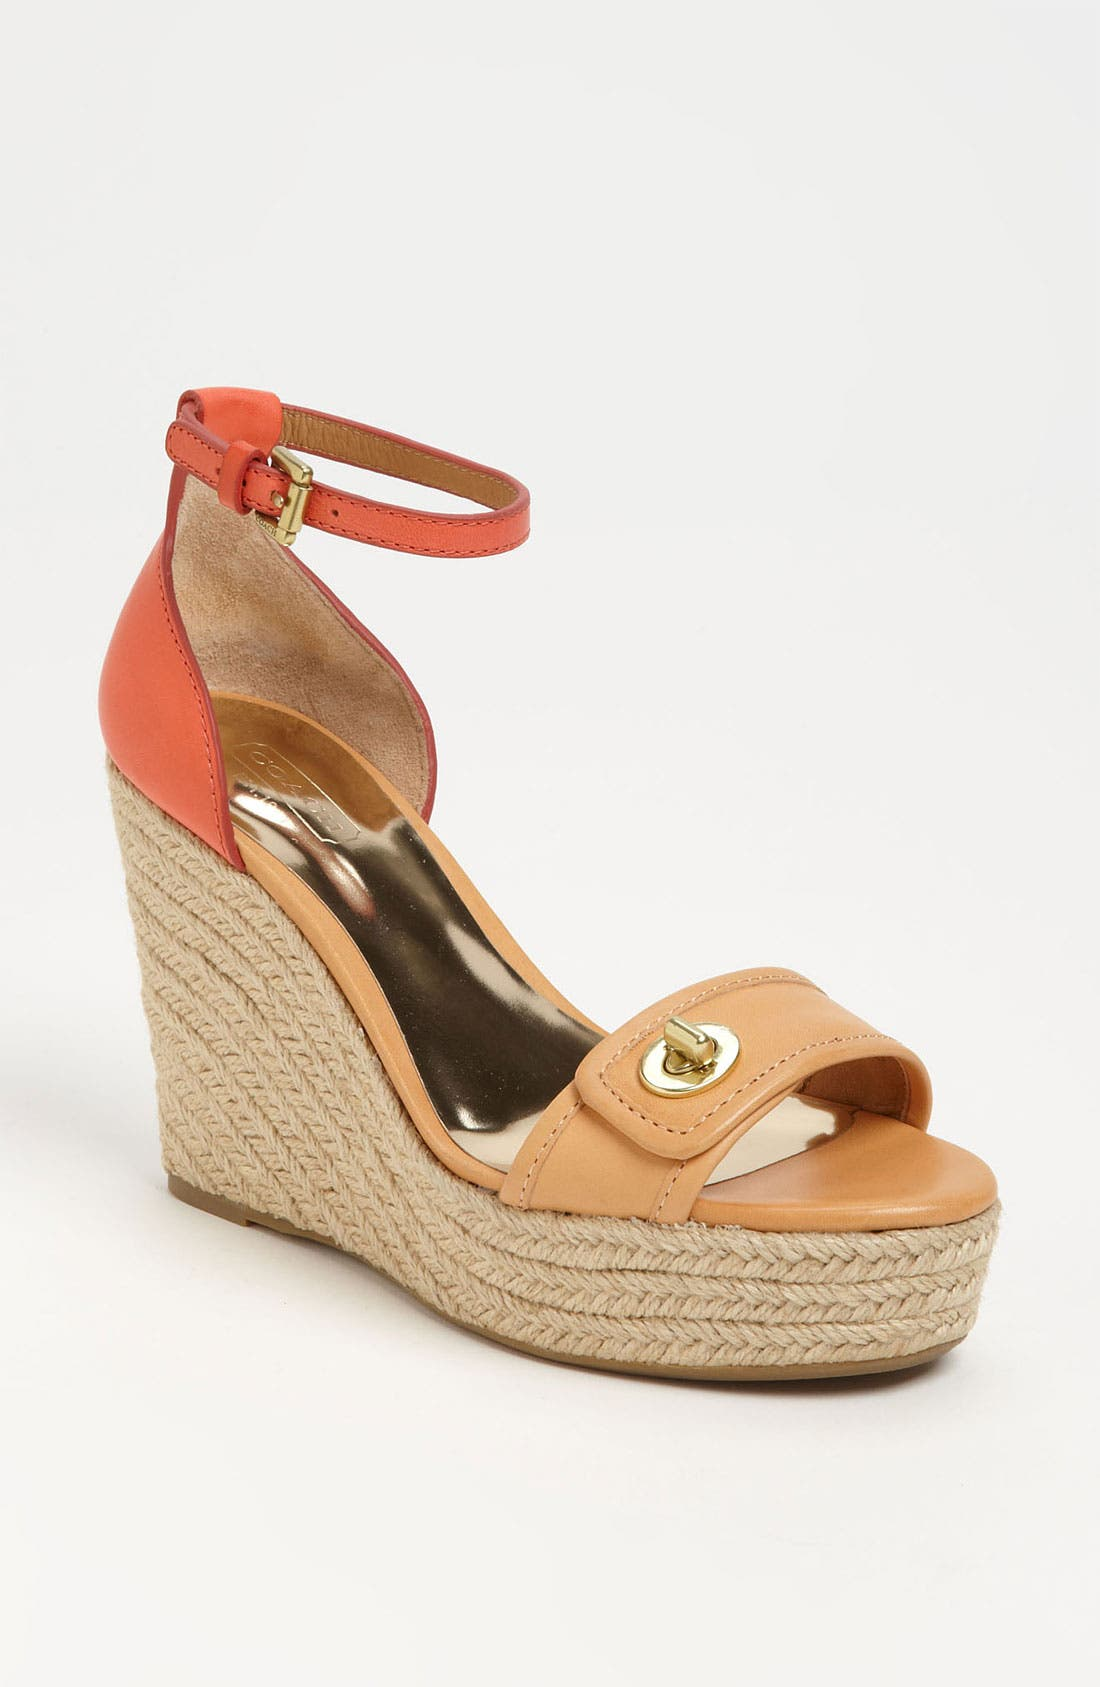 Alternate Image 1 Selected - COACH 'Glinda' Sandal